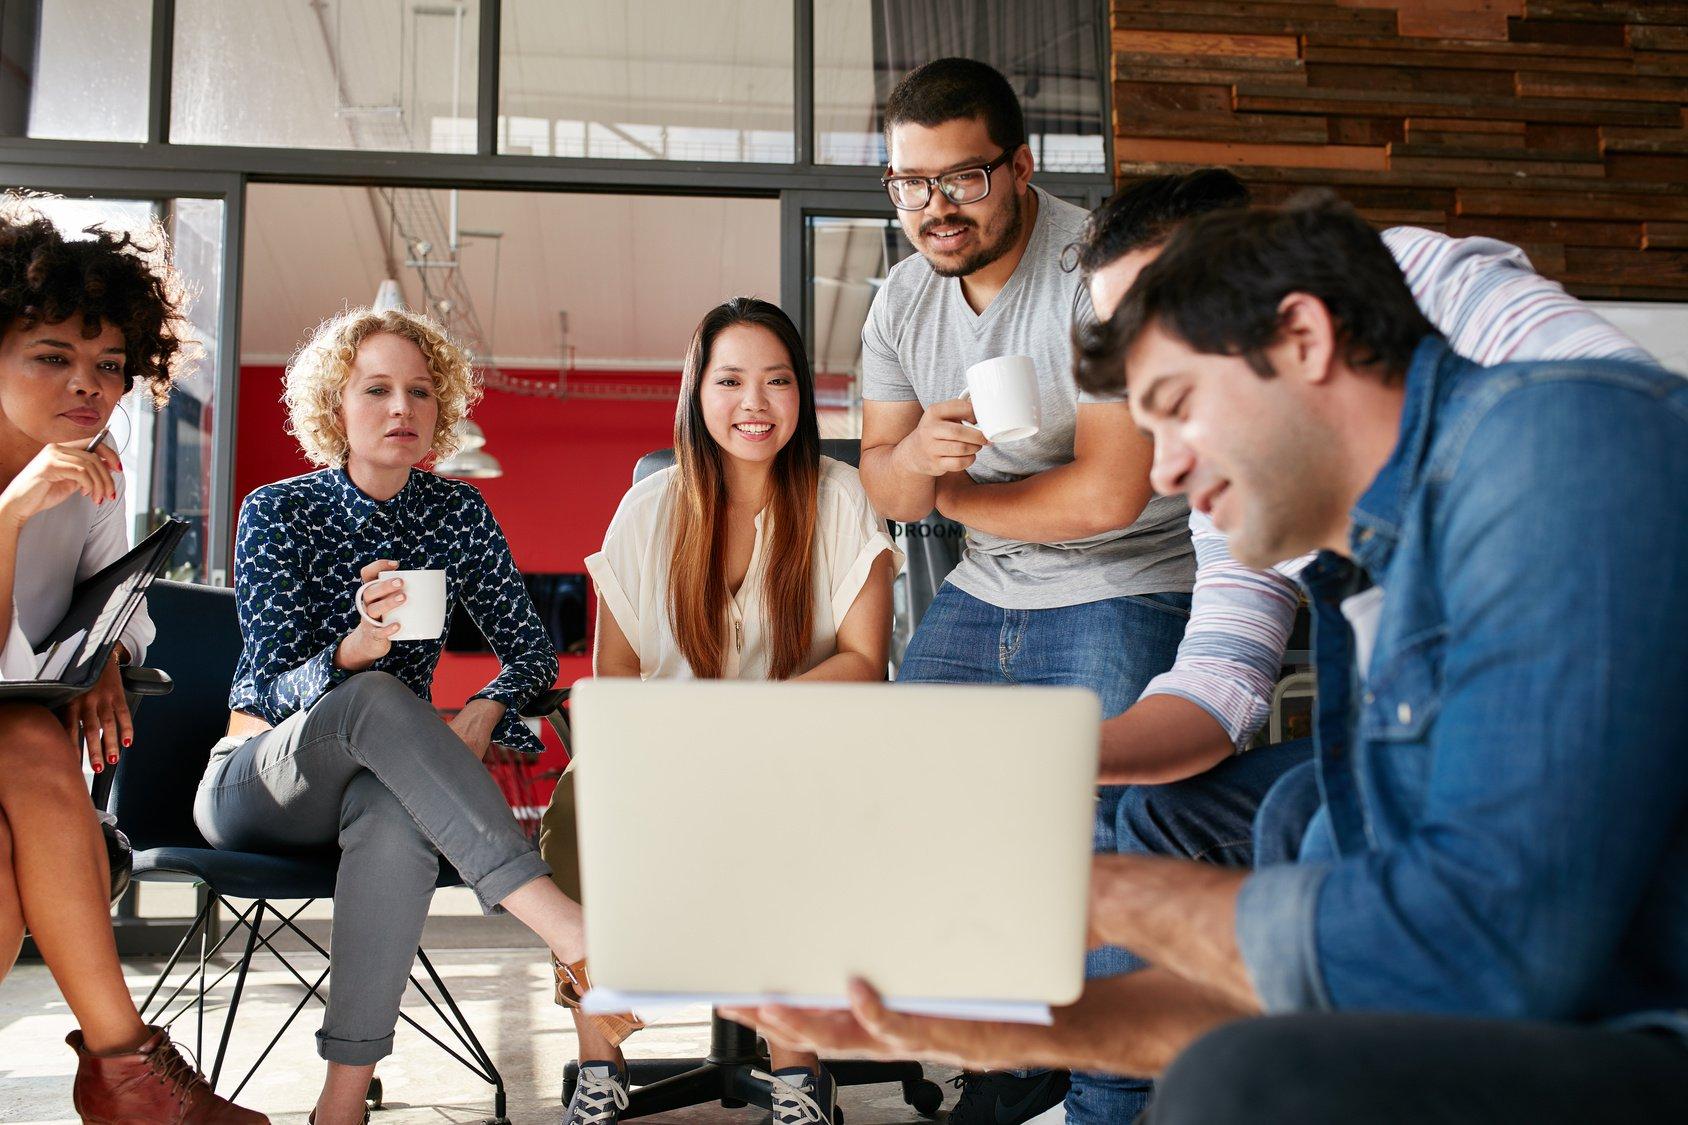 Creative-team-meeting-at-office.jpg